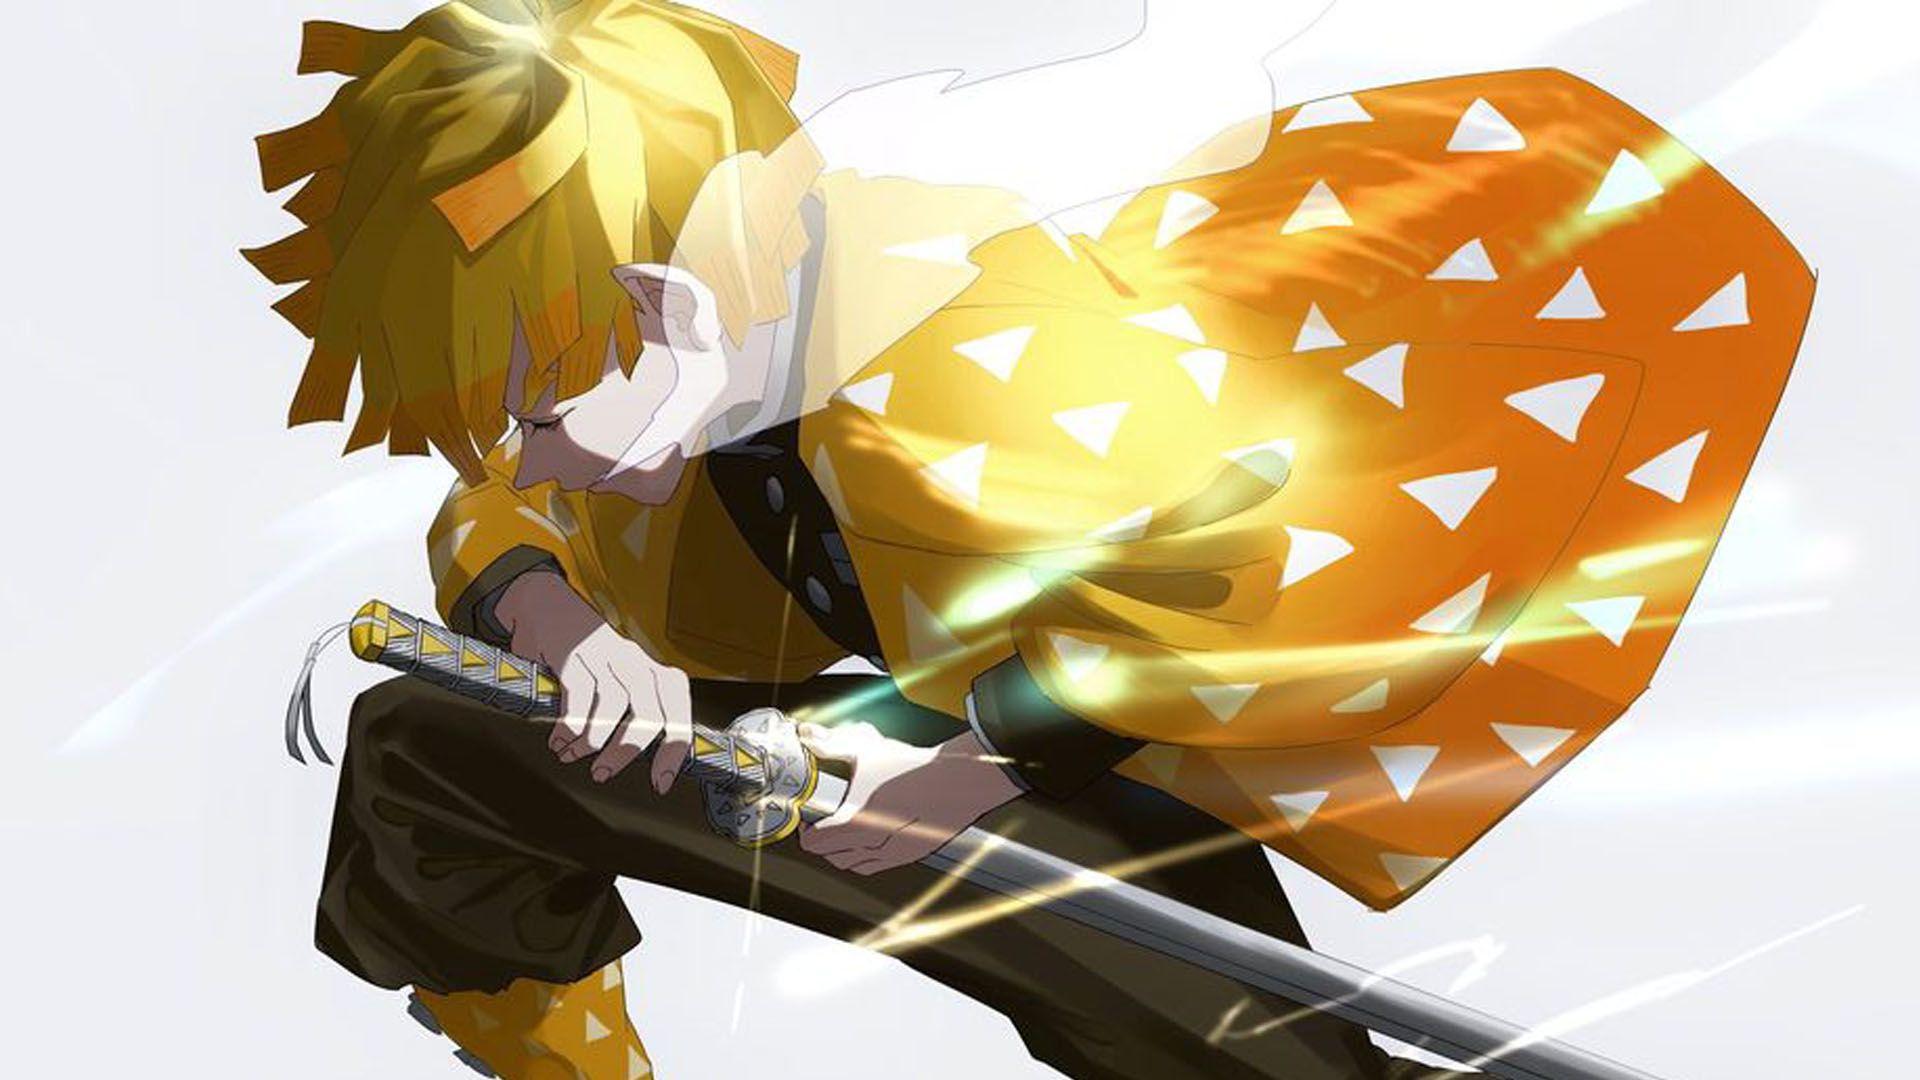 Pin Di Kimetsu No Yaiba Mobile Wallpaper Download wallpaper anime pedang